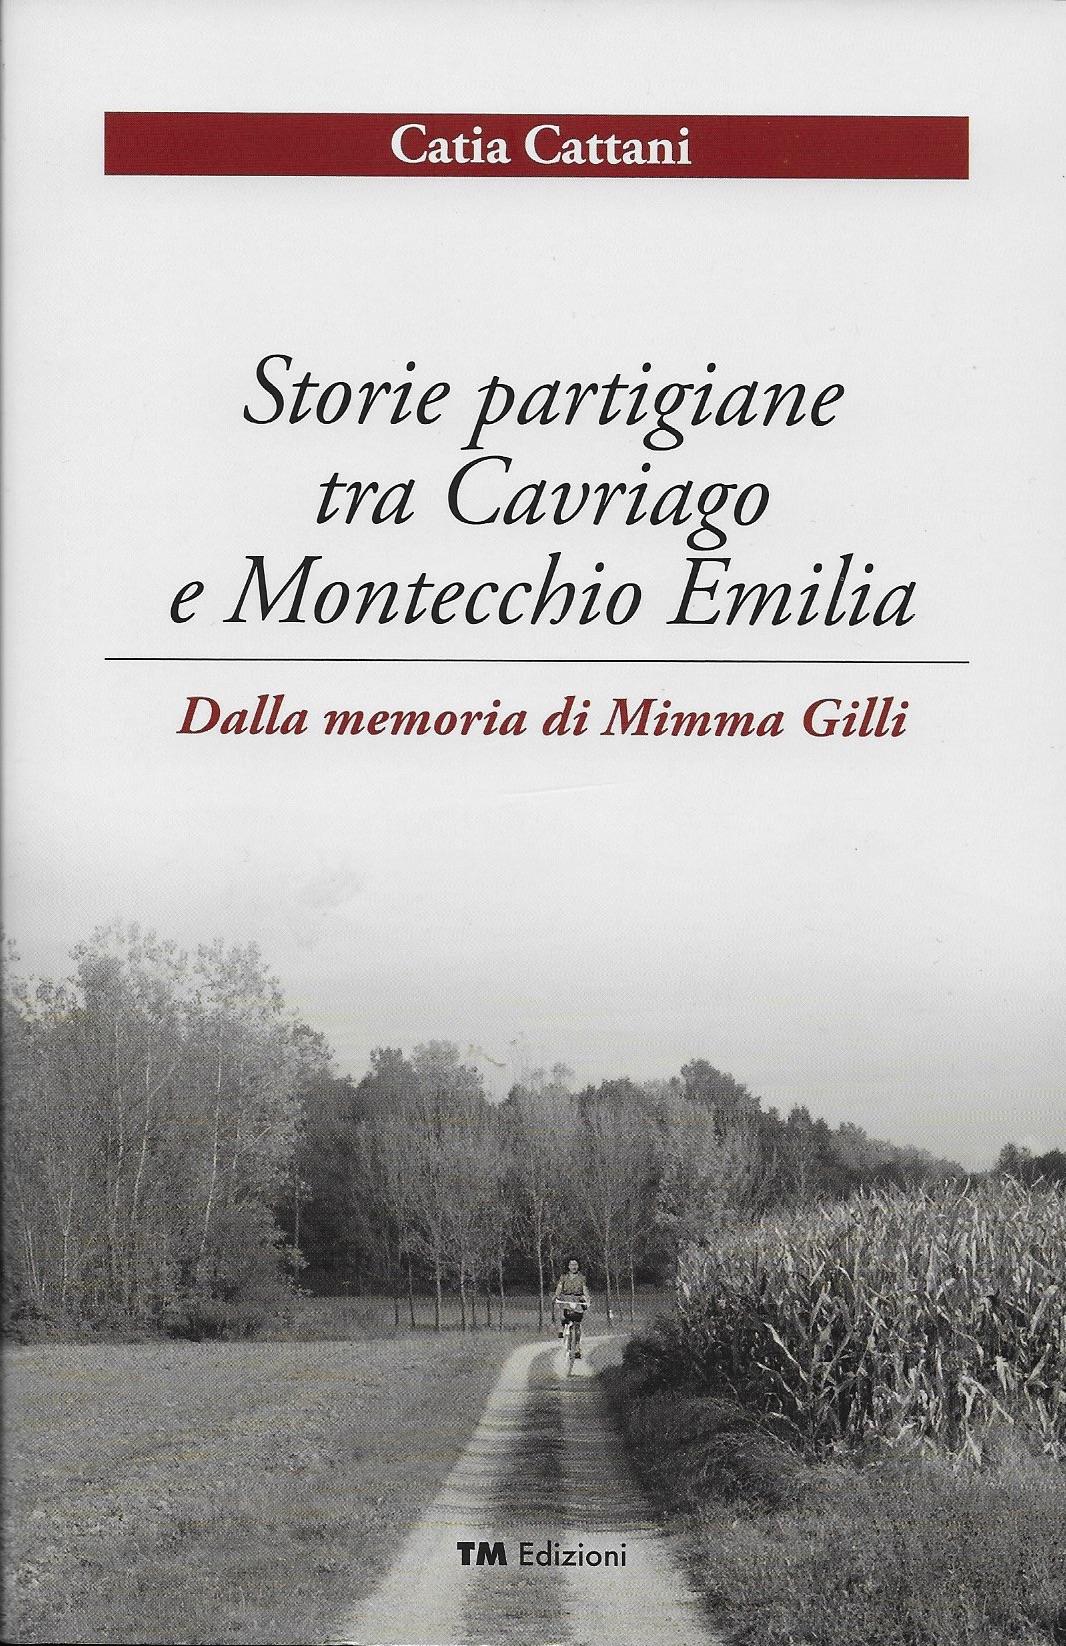 Storie partigiane tra Cavriago e Montecchio Emilia